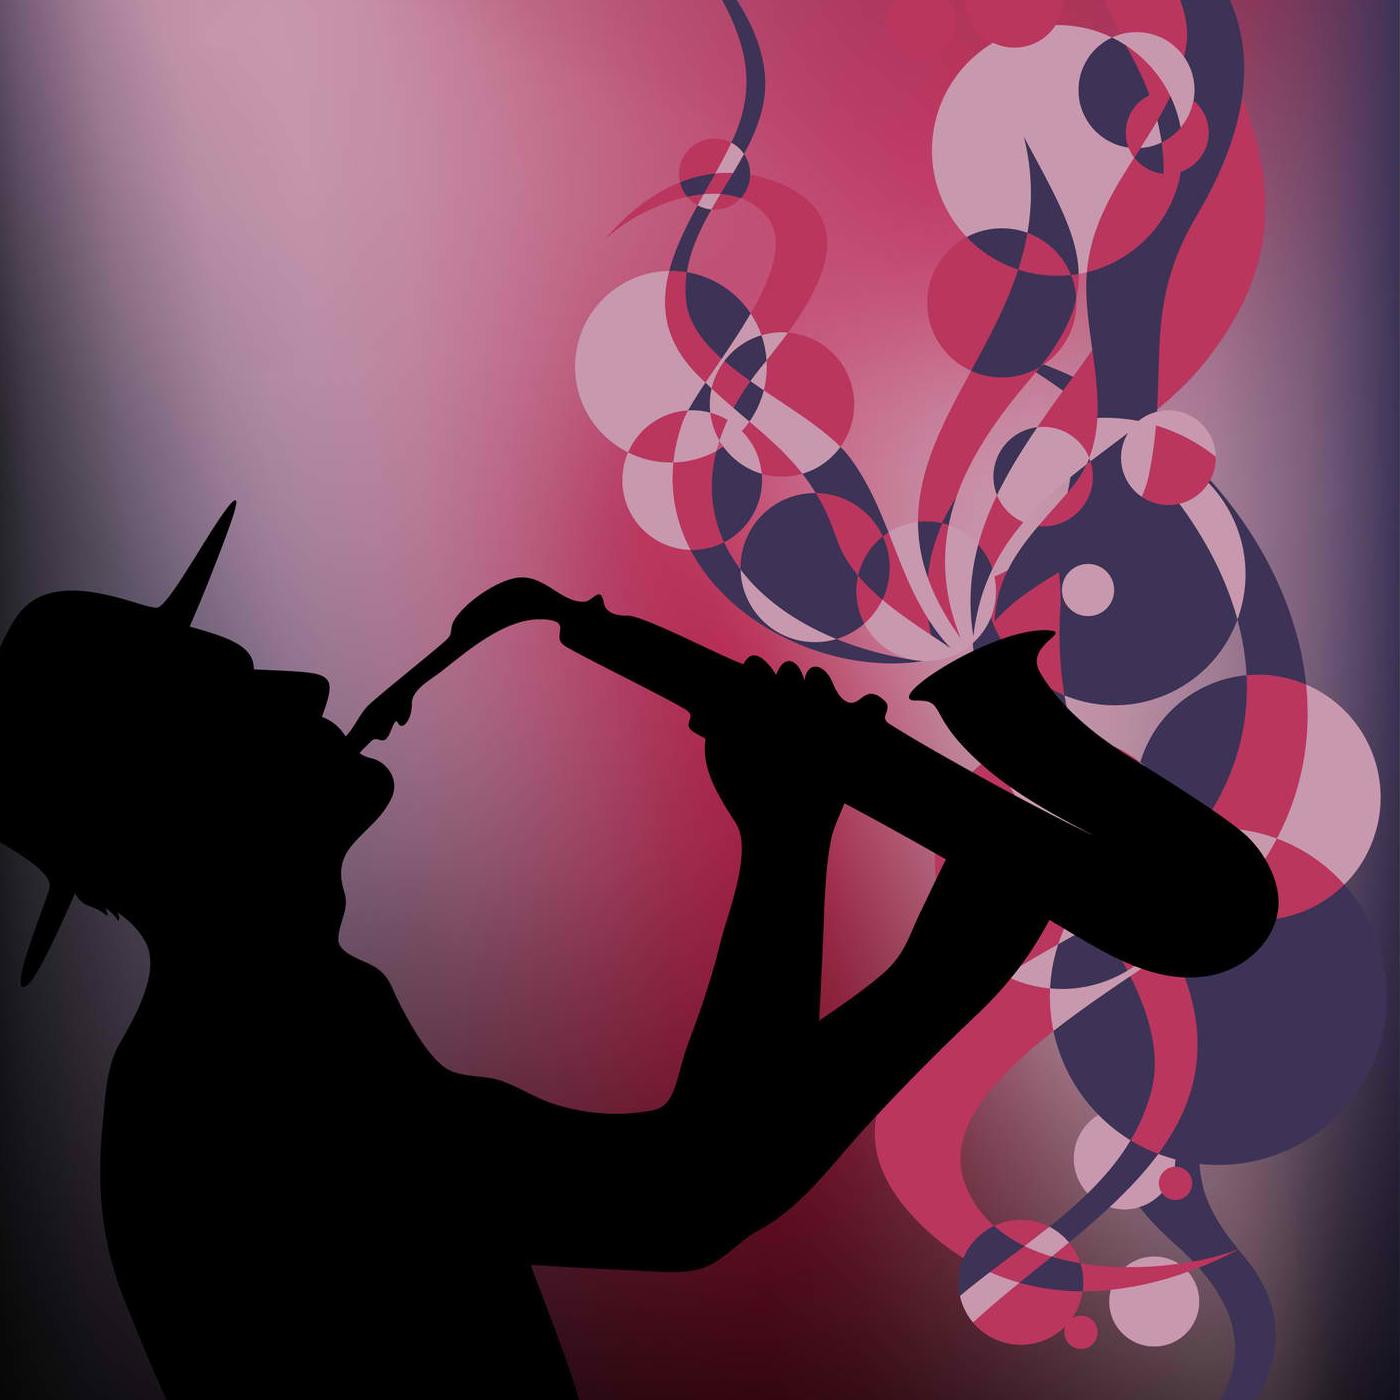 Mobile Apps - JAZZRADIO com - enjoy great jazz music